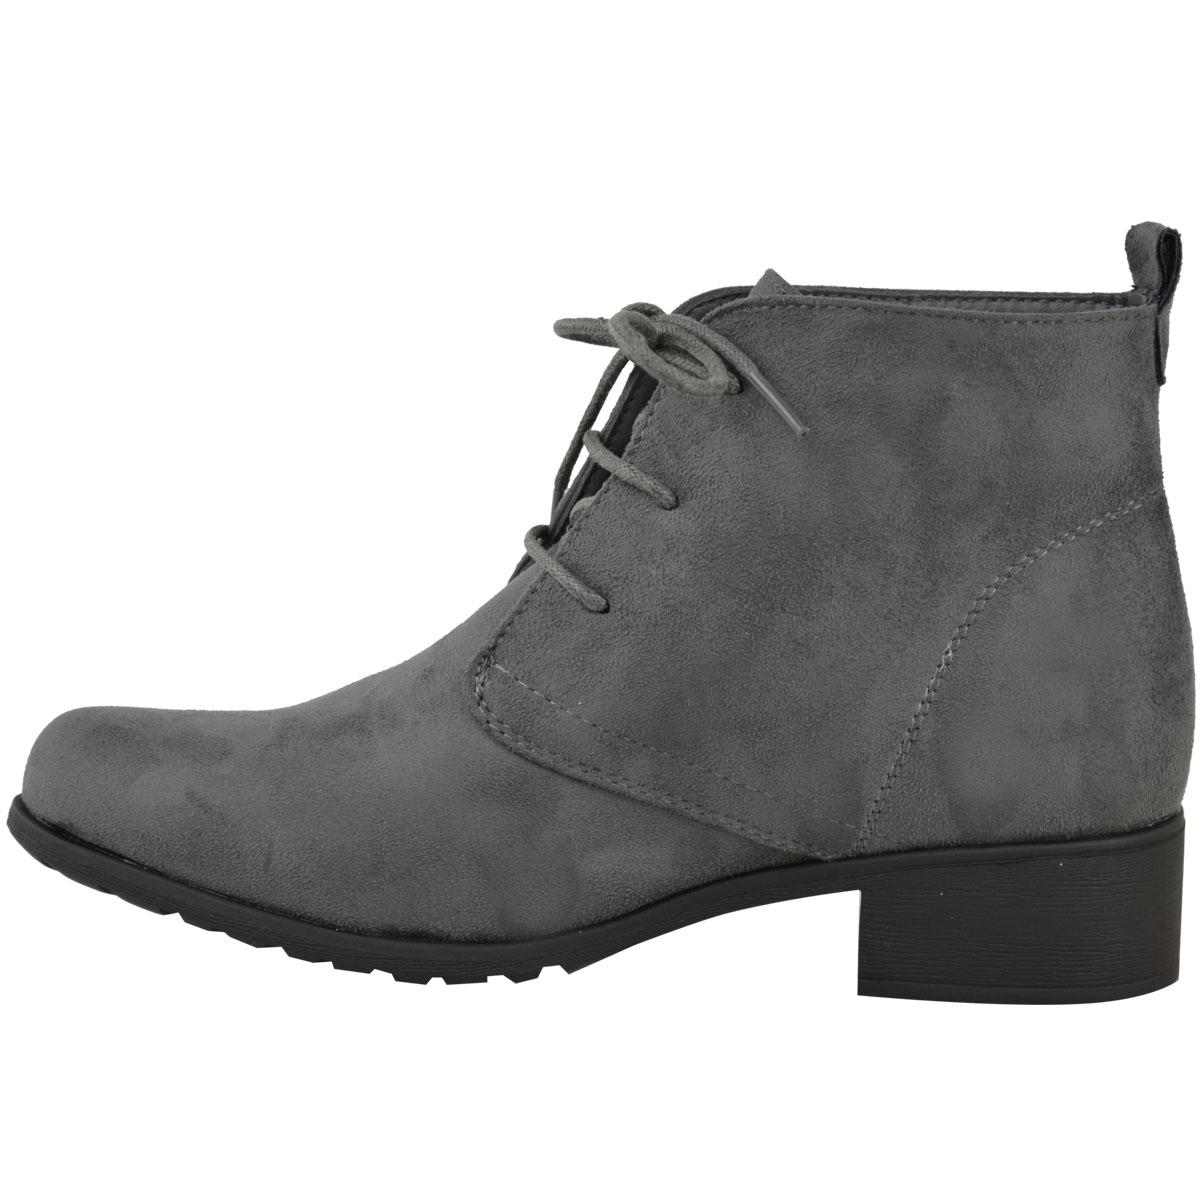 womens flat low heel black ankle boots work office